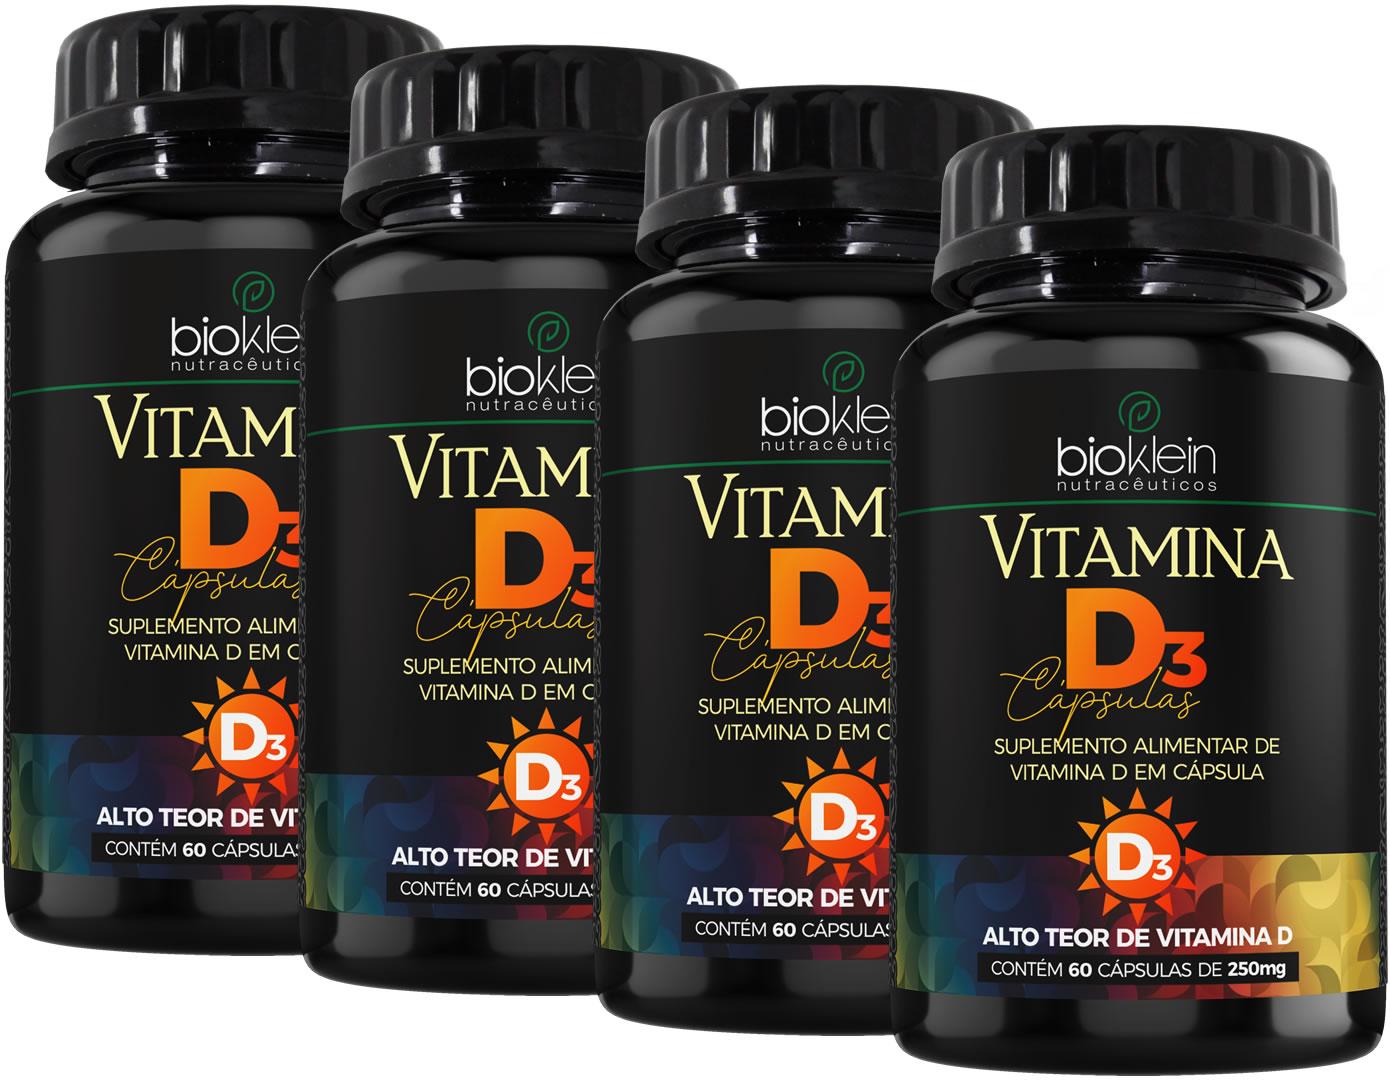 4x Vitamina D3 240 (4x60) Cápsulas de 250mg Bioklein